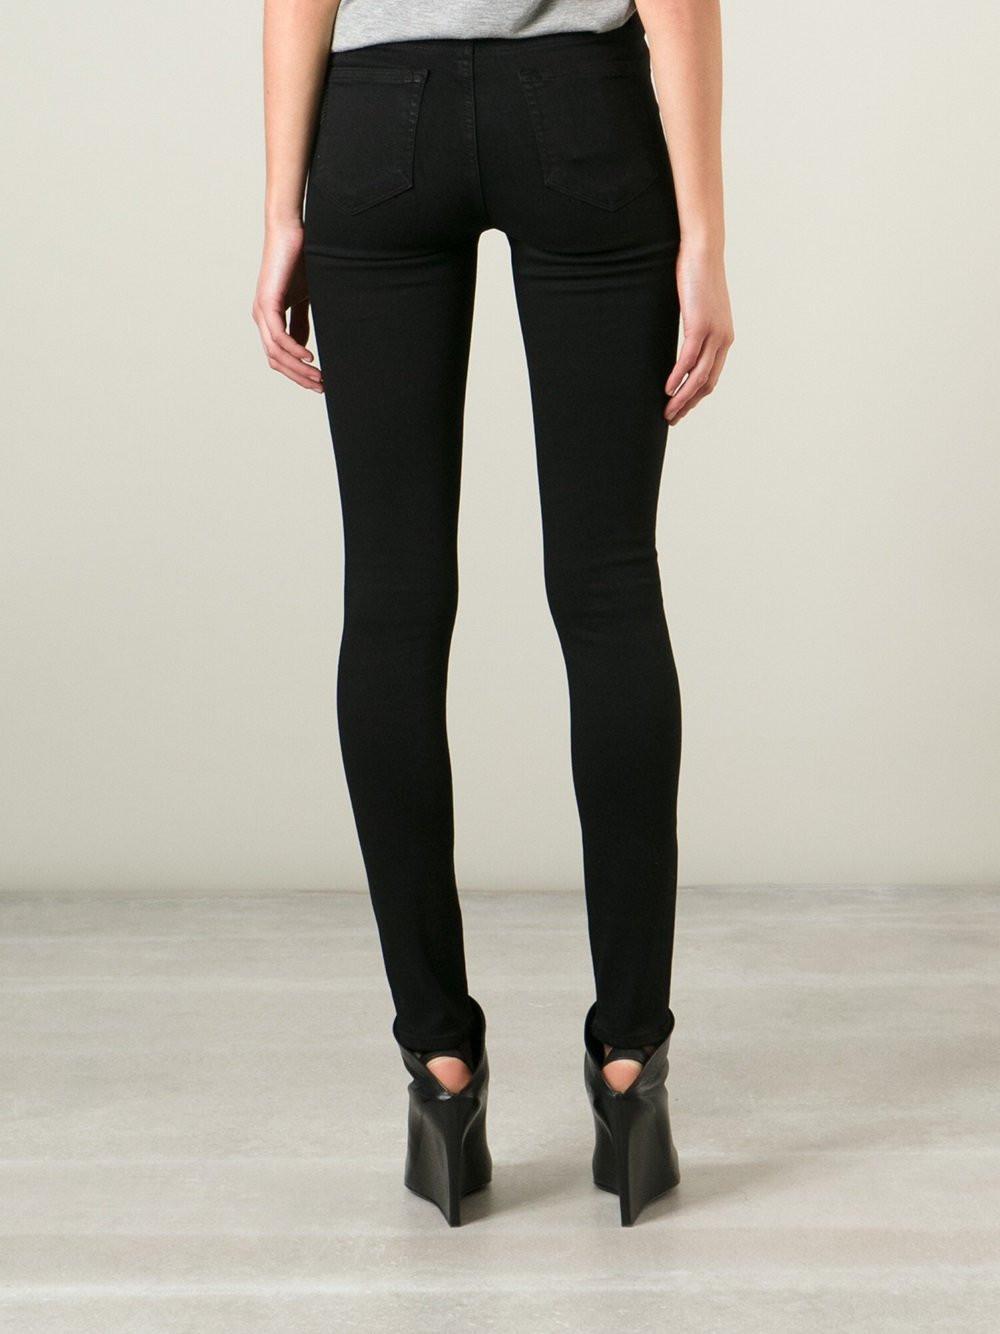 Paige Denim Hoxton Ultra Skinny Jeans In Black Lyst